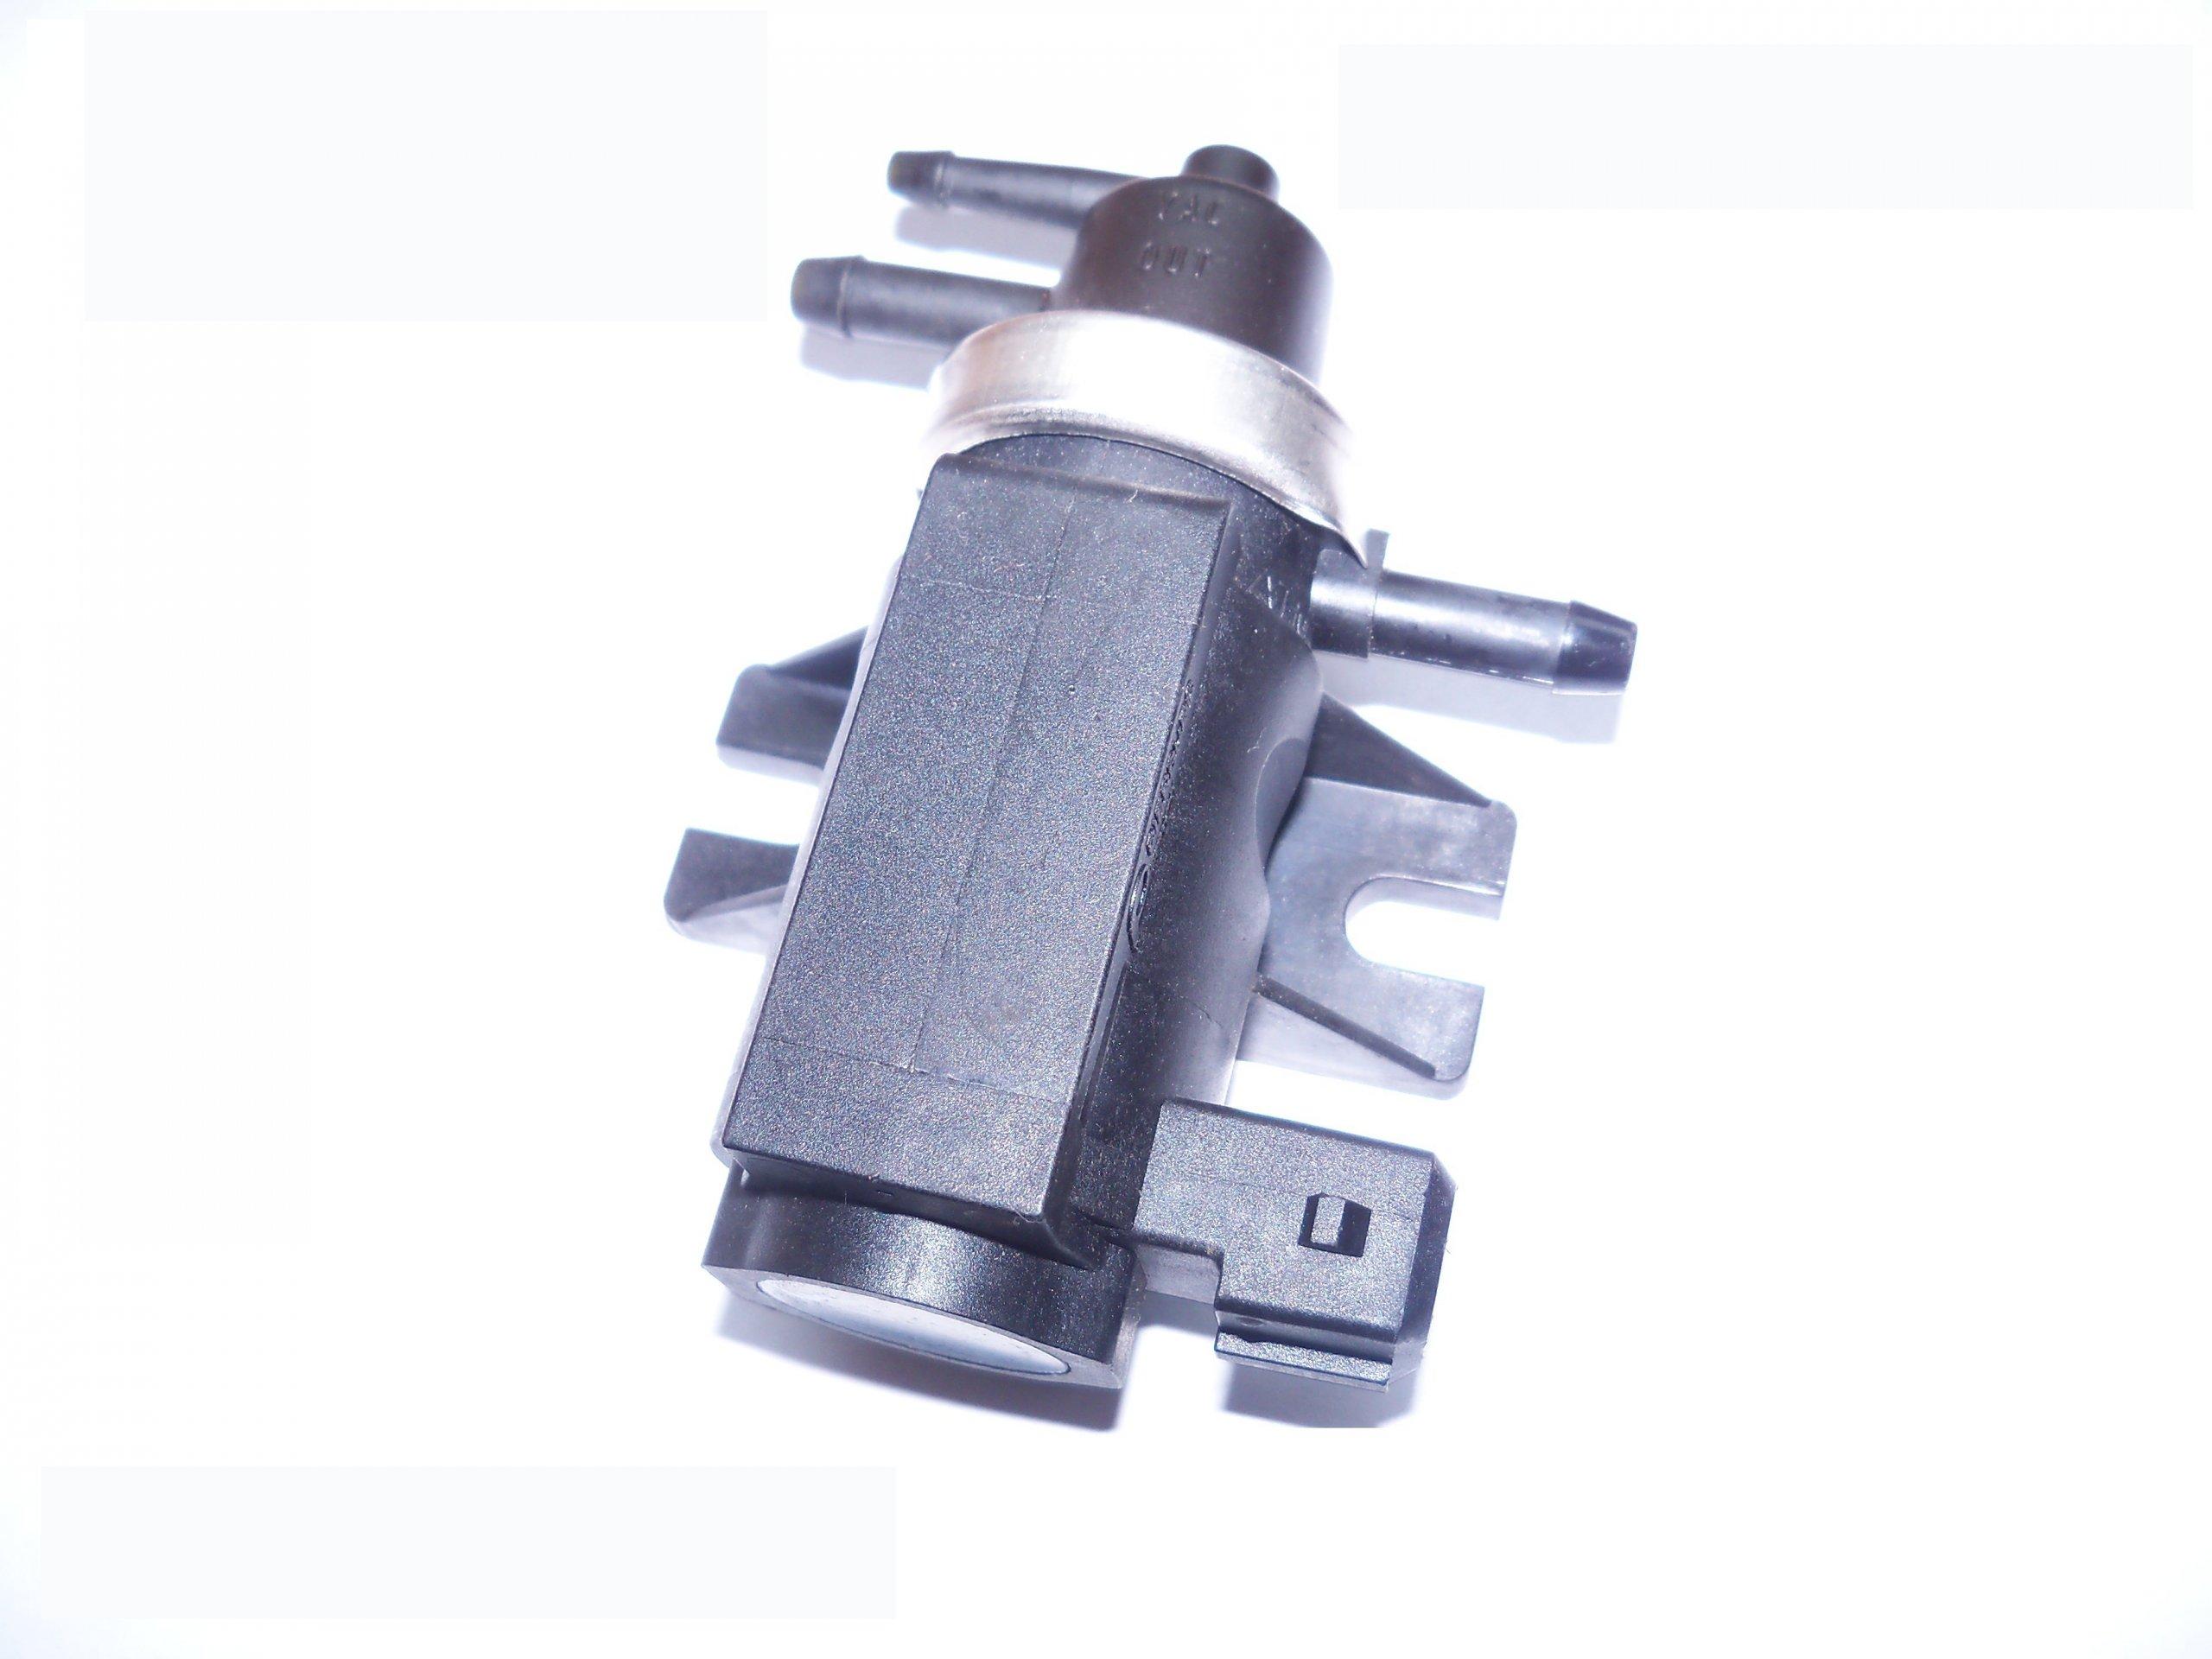 клапан n75 турбины n18 системы рециркуляции ог vw гольф 4 iv 19tdi